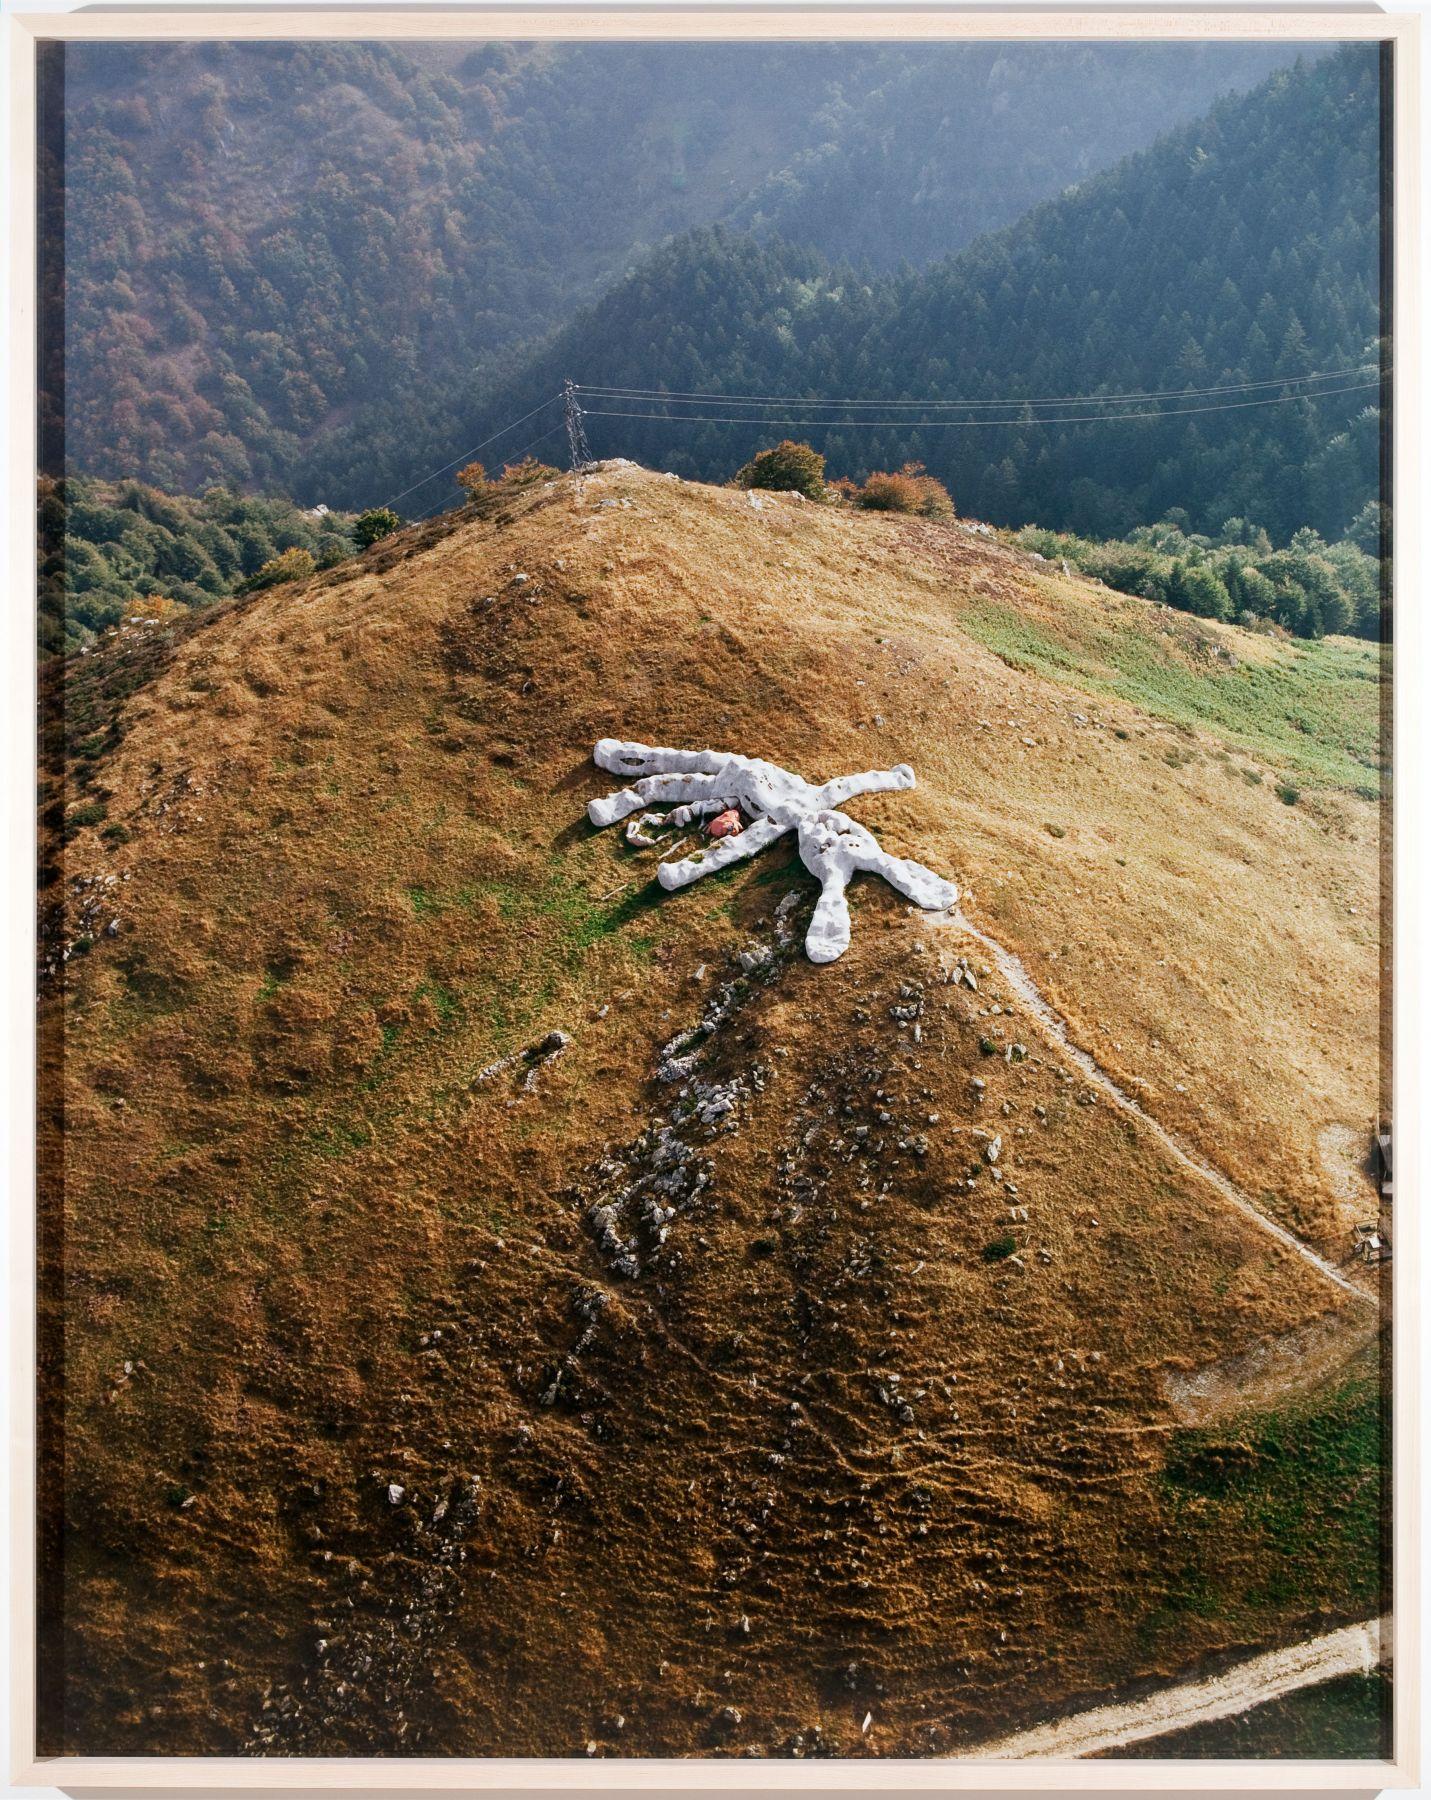 gelitin Hase, 2009 C-print 65 1/8 x 51 3/8 inches (165.4 x 130.5 cm)